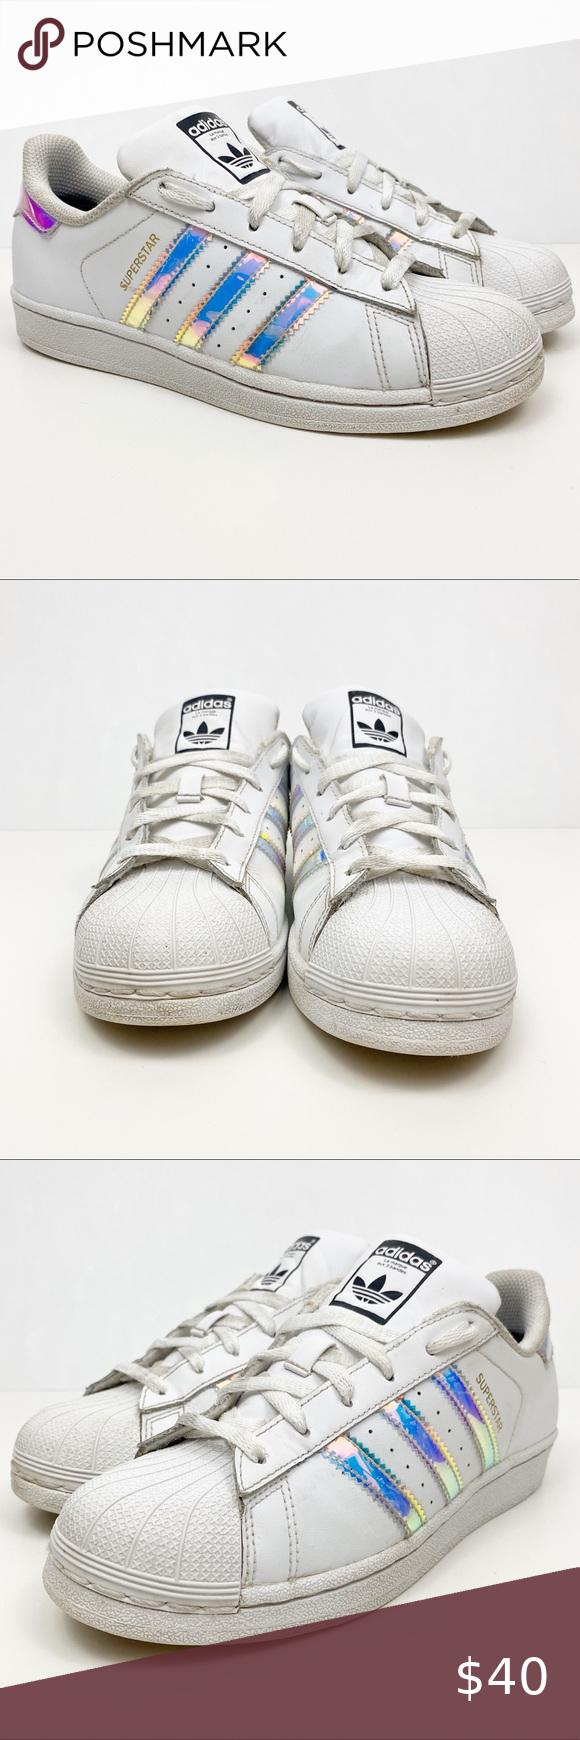 Adidas Superstar Metallic Silver Size 5.5 | Superstars shoes ...